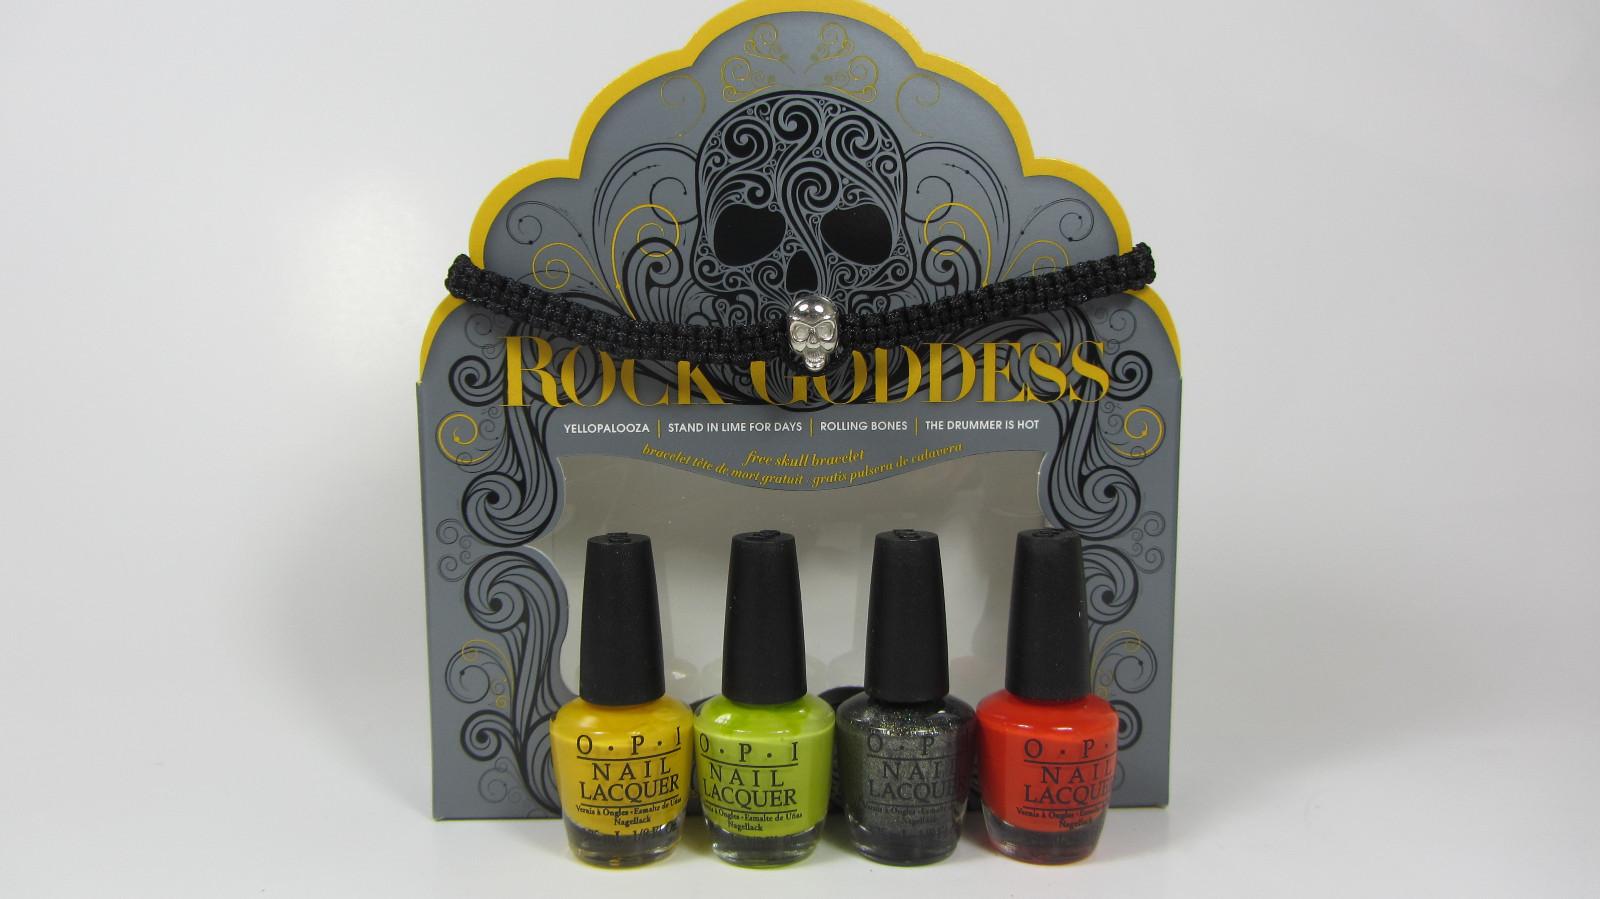 Fashion week Opi goddess rock halloween nail polish collection for lady